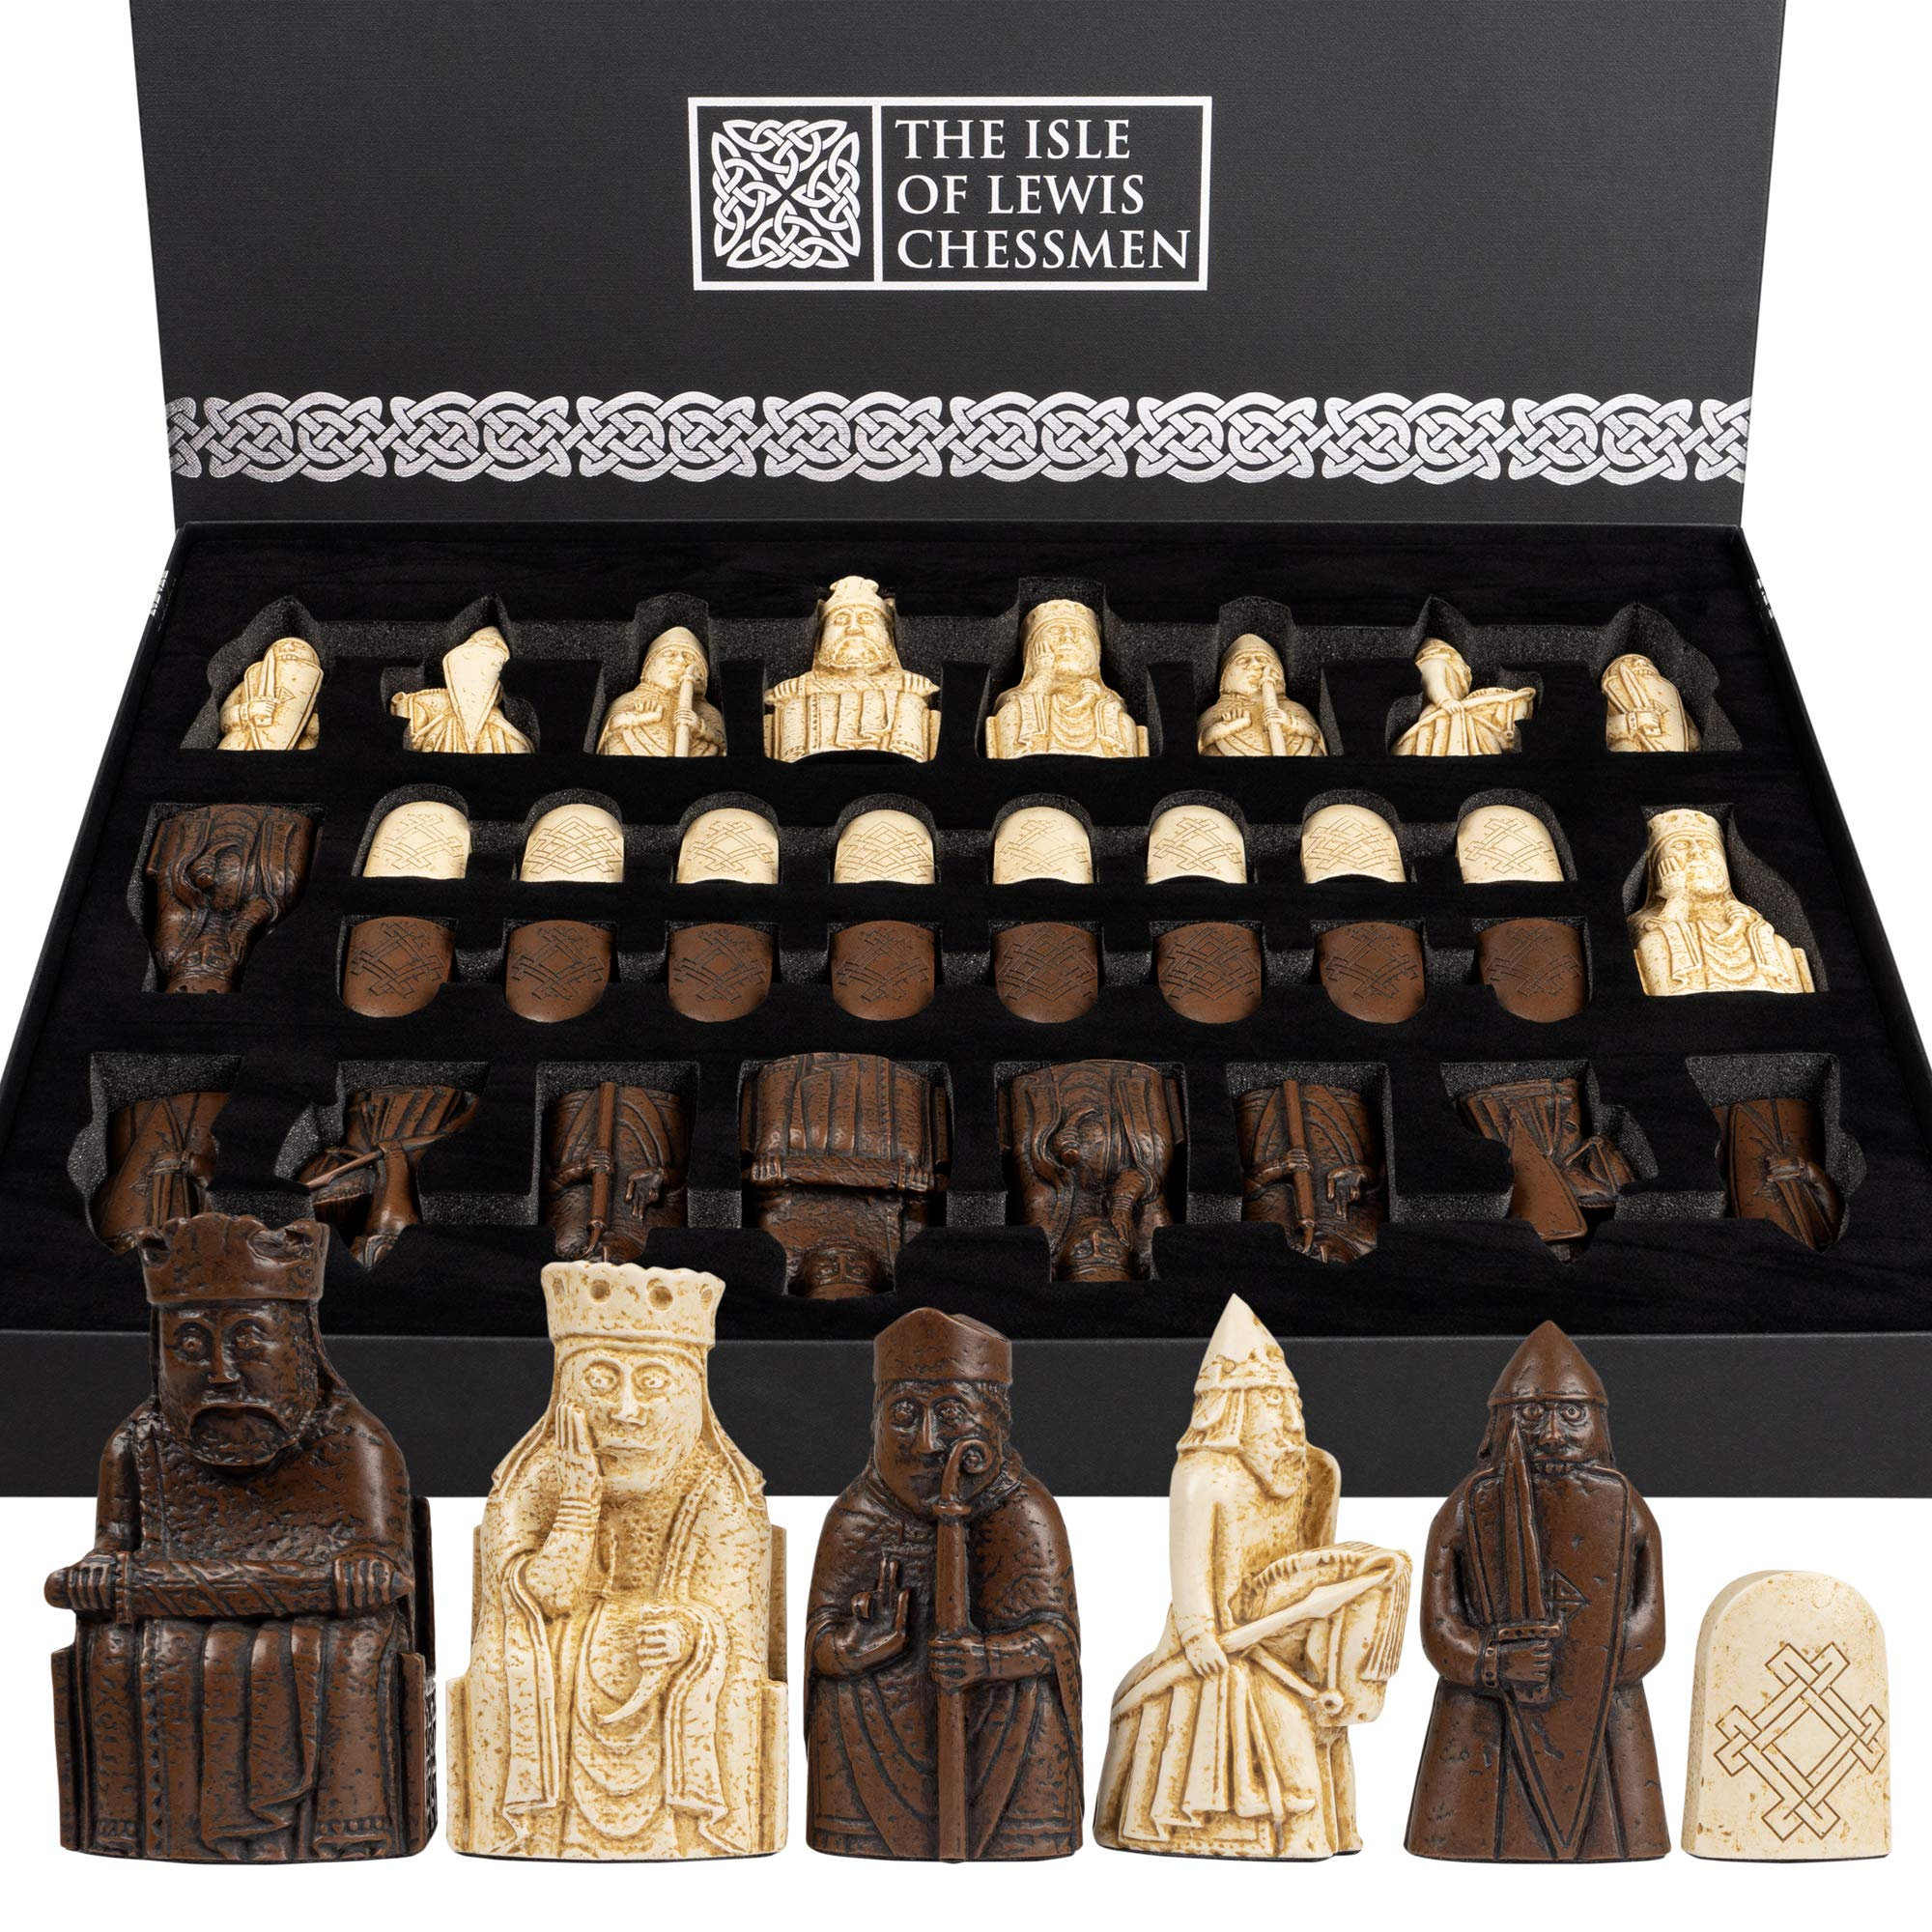 King Replica Chess Piece 10cm Buzz The Lewis Chessmen